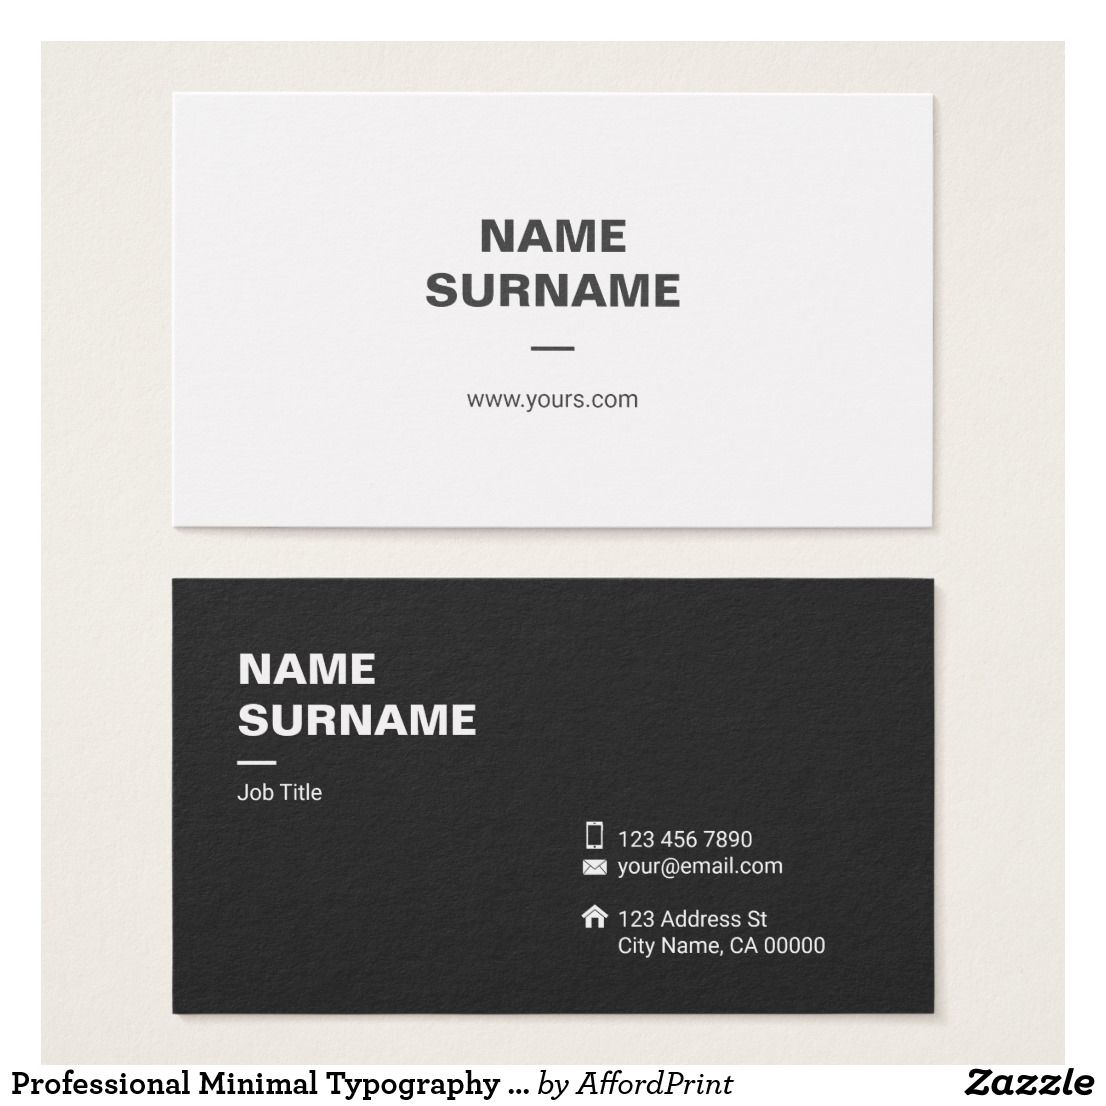 Professional Minimal Typography Business Card Zazzle Com